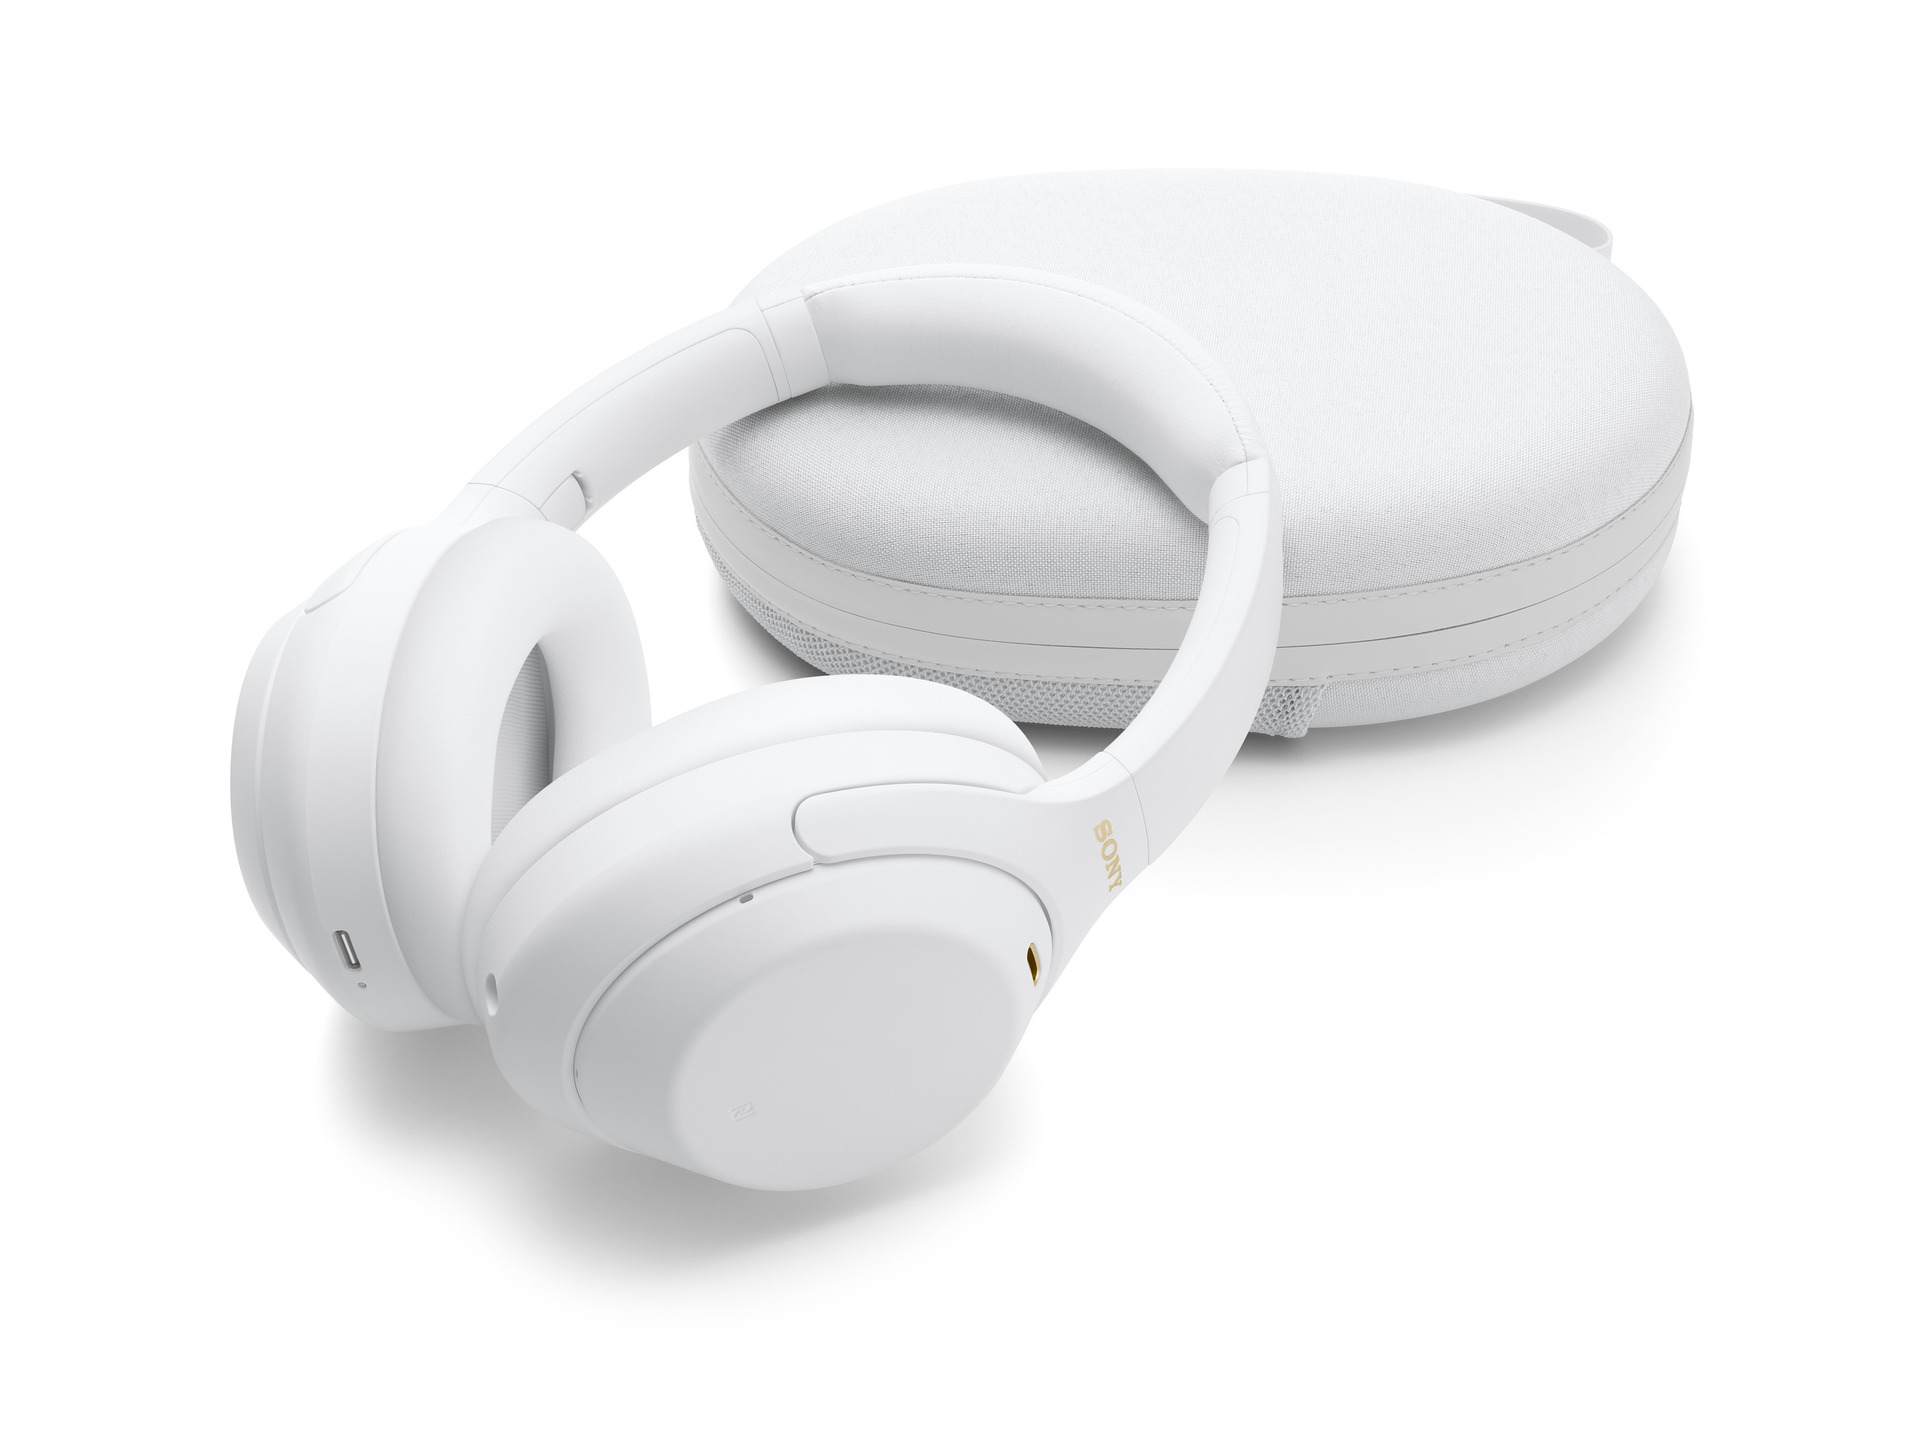 WH-1000XM4 Silent White